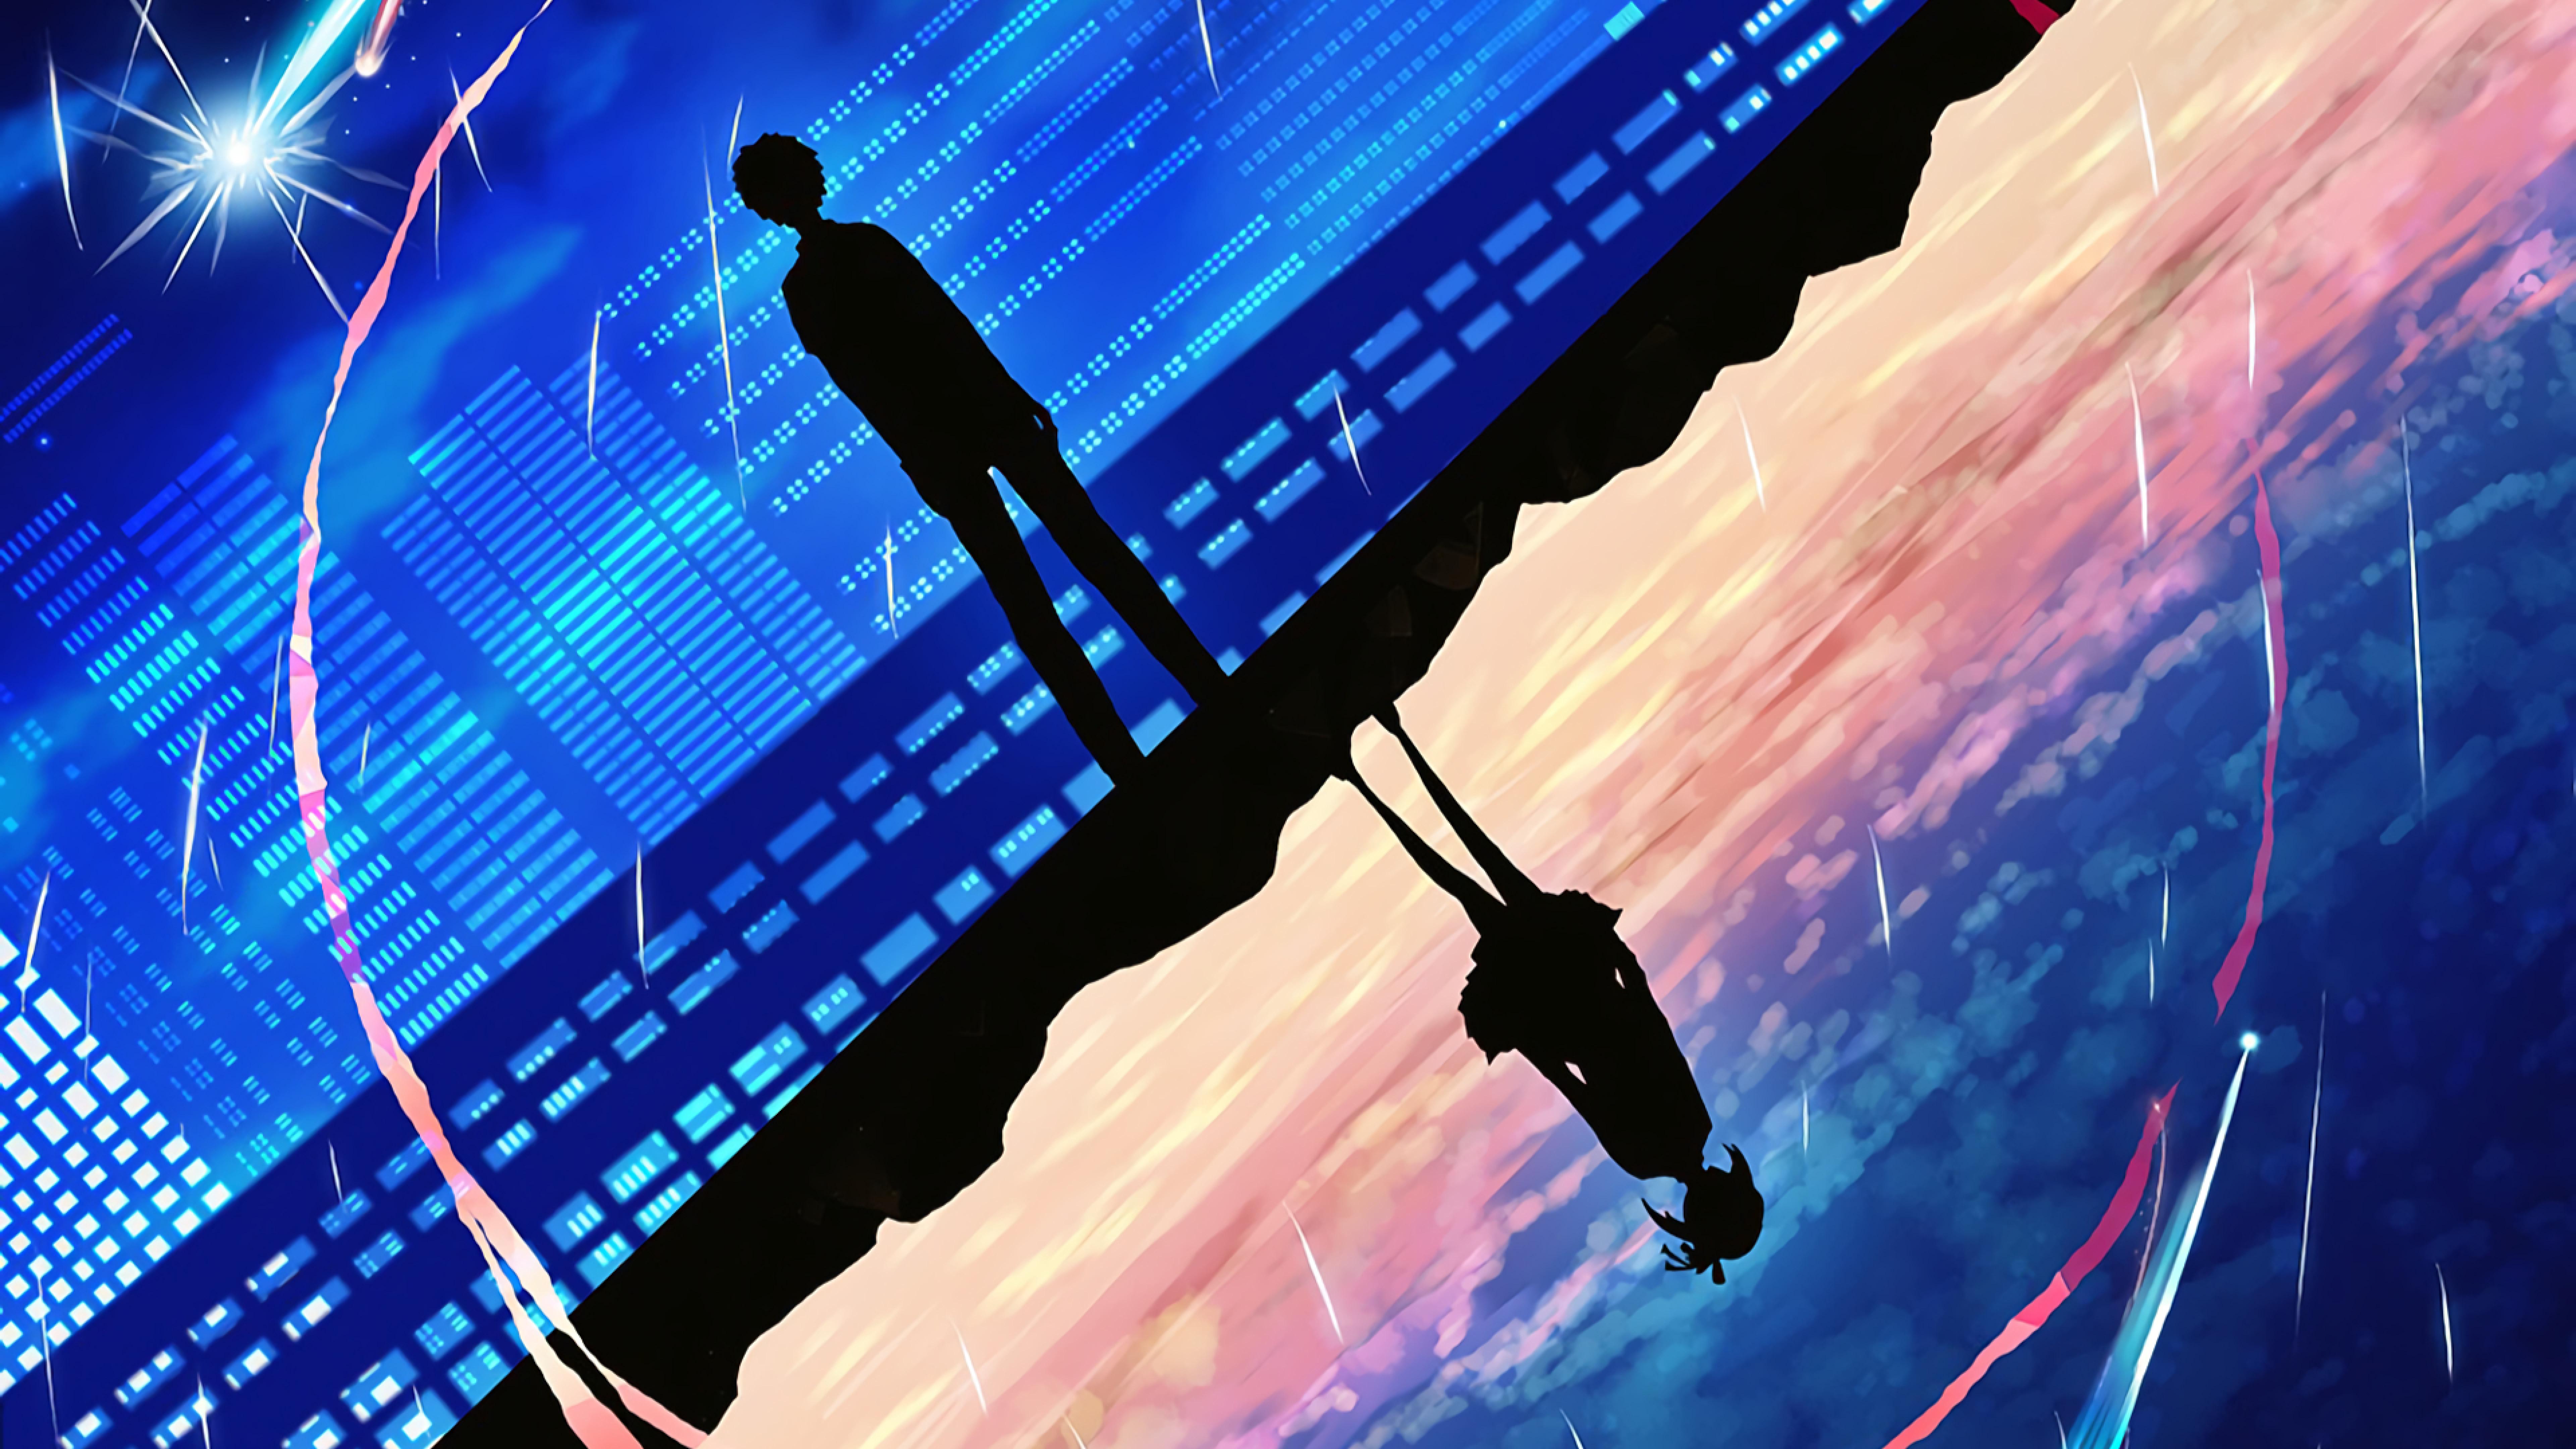 7680x4320 Kimi no Na wa Your Name 8K Wallpaper HD Anime 4K 7680x4320